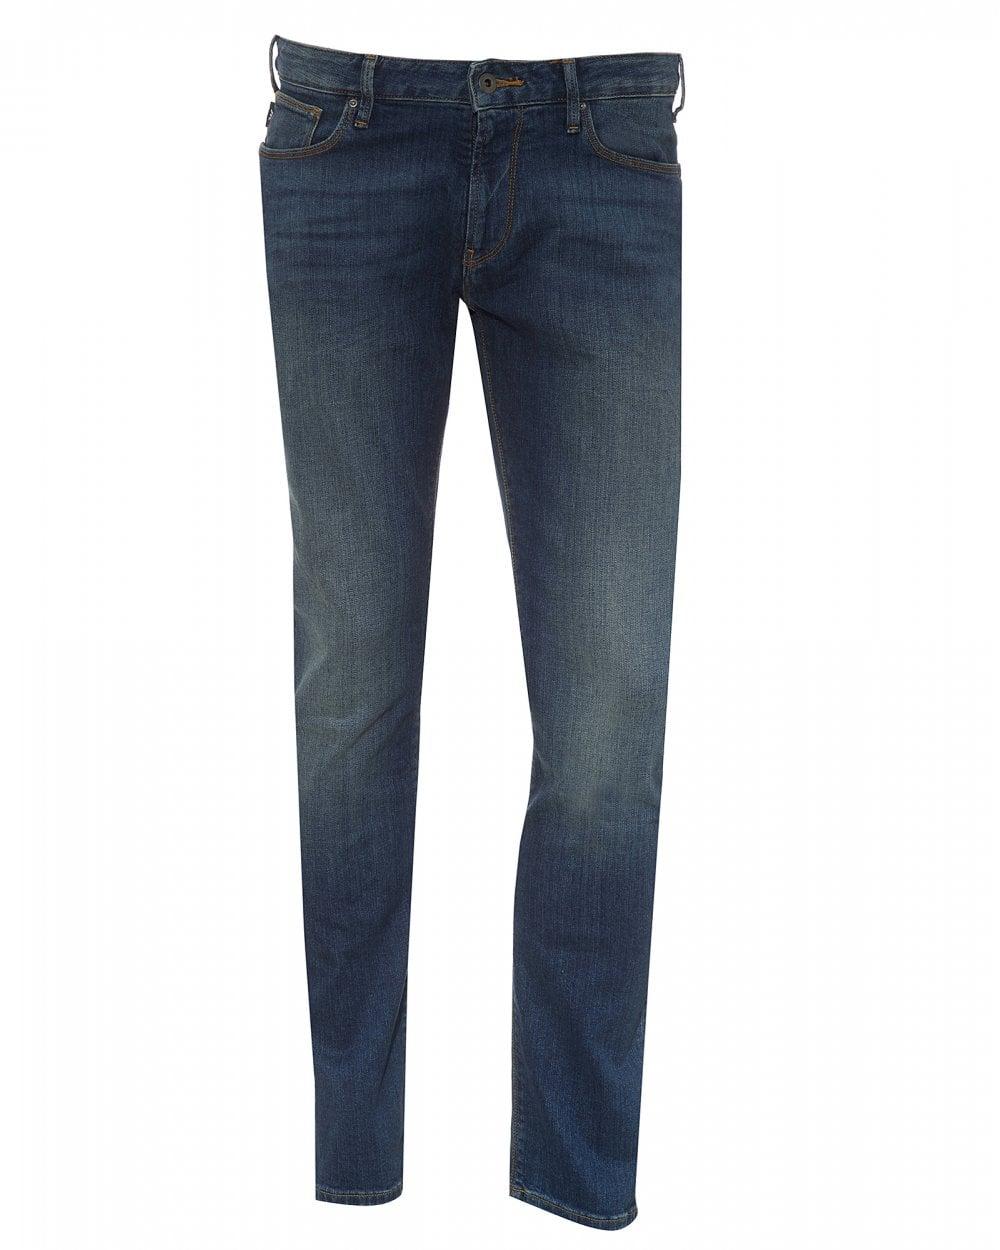 e9a652fe Mens J06 Mid Vintage Blue Slim Fit Jeans, Straight Denim